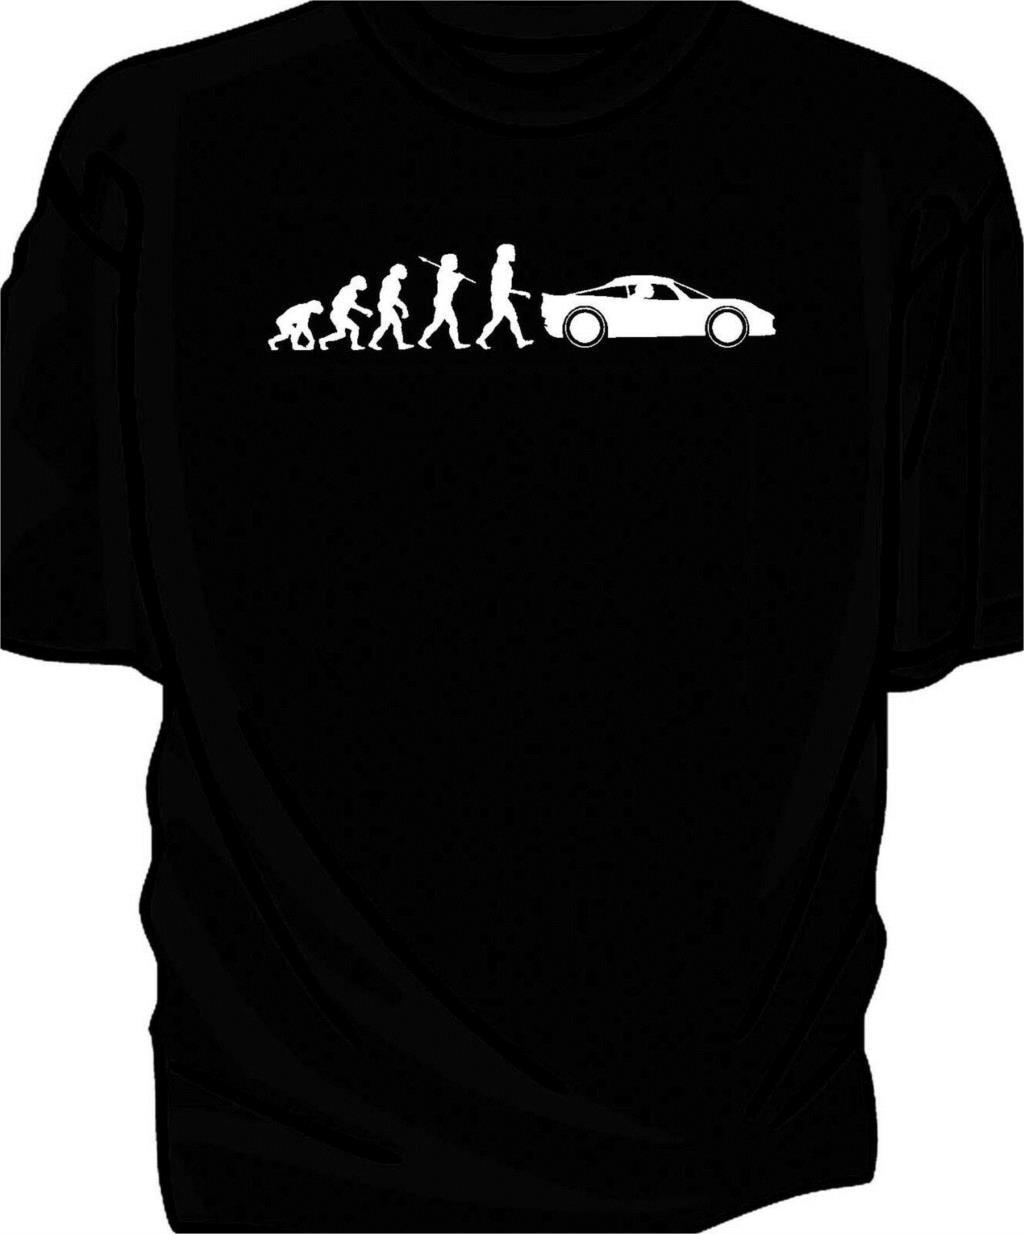 Evolution Of Man Classic Car T-Shirt. Lotus Elise